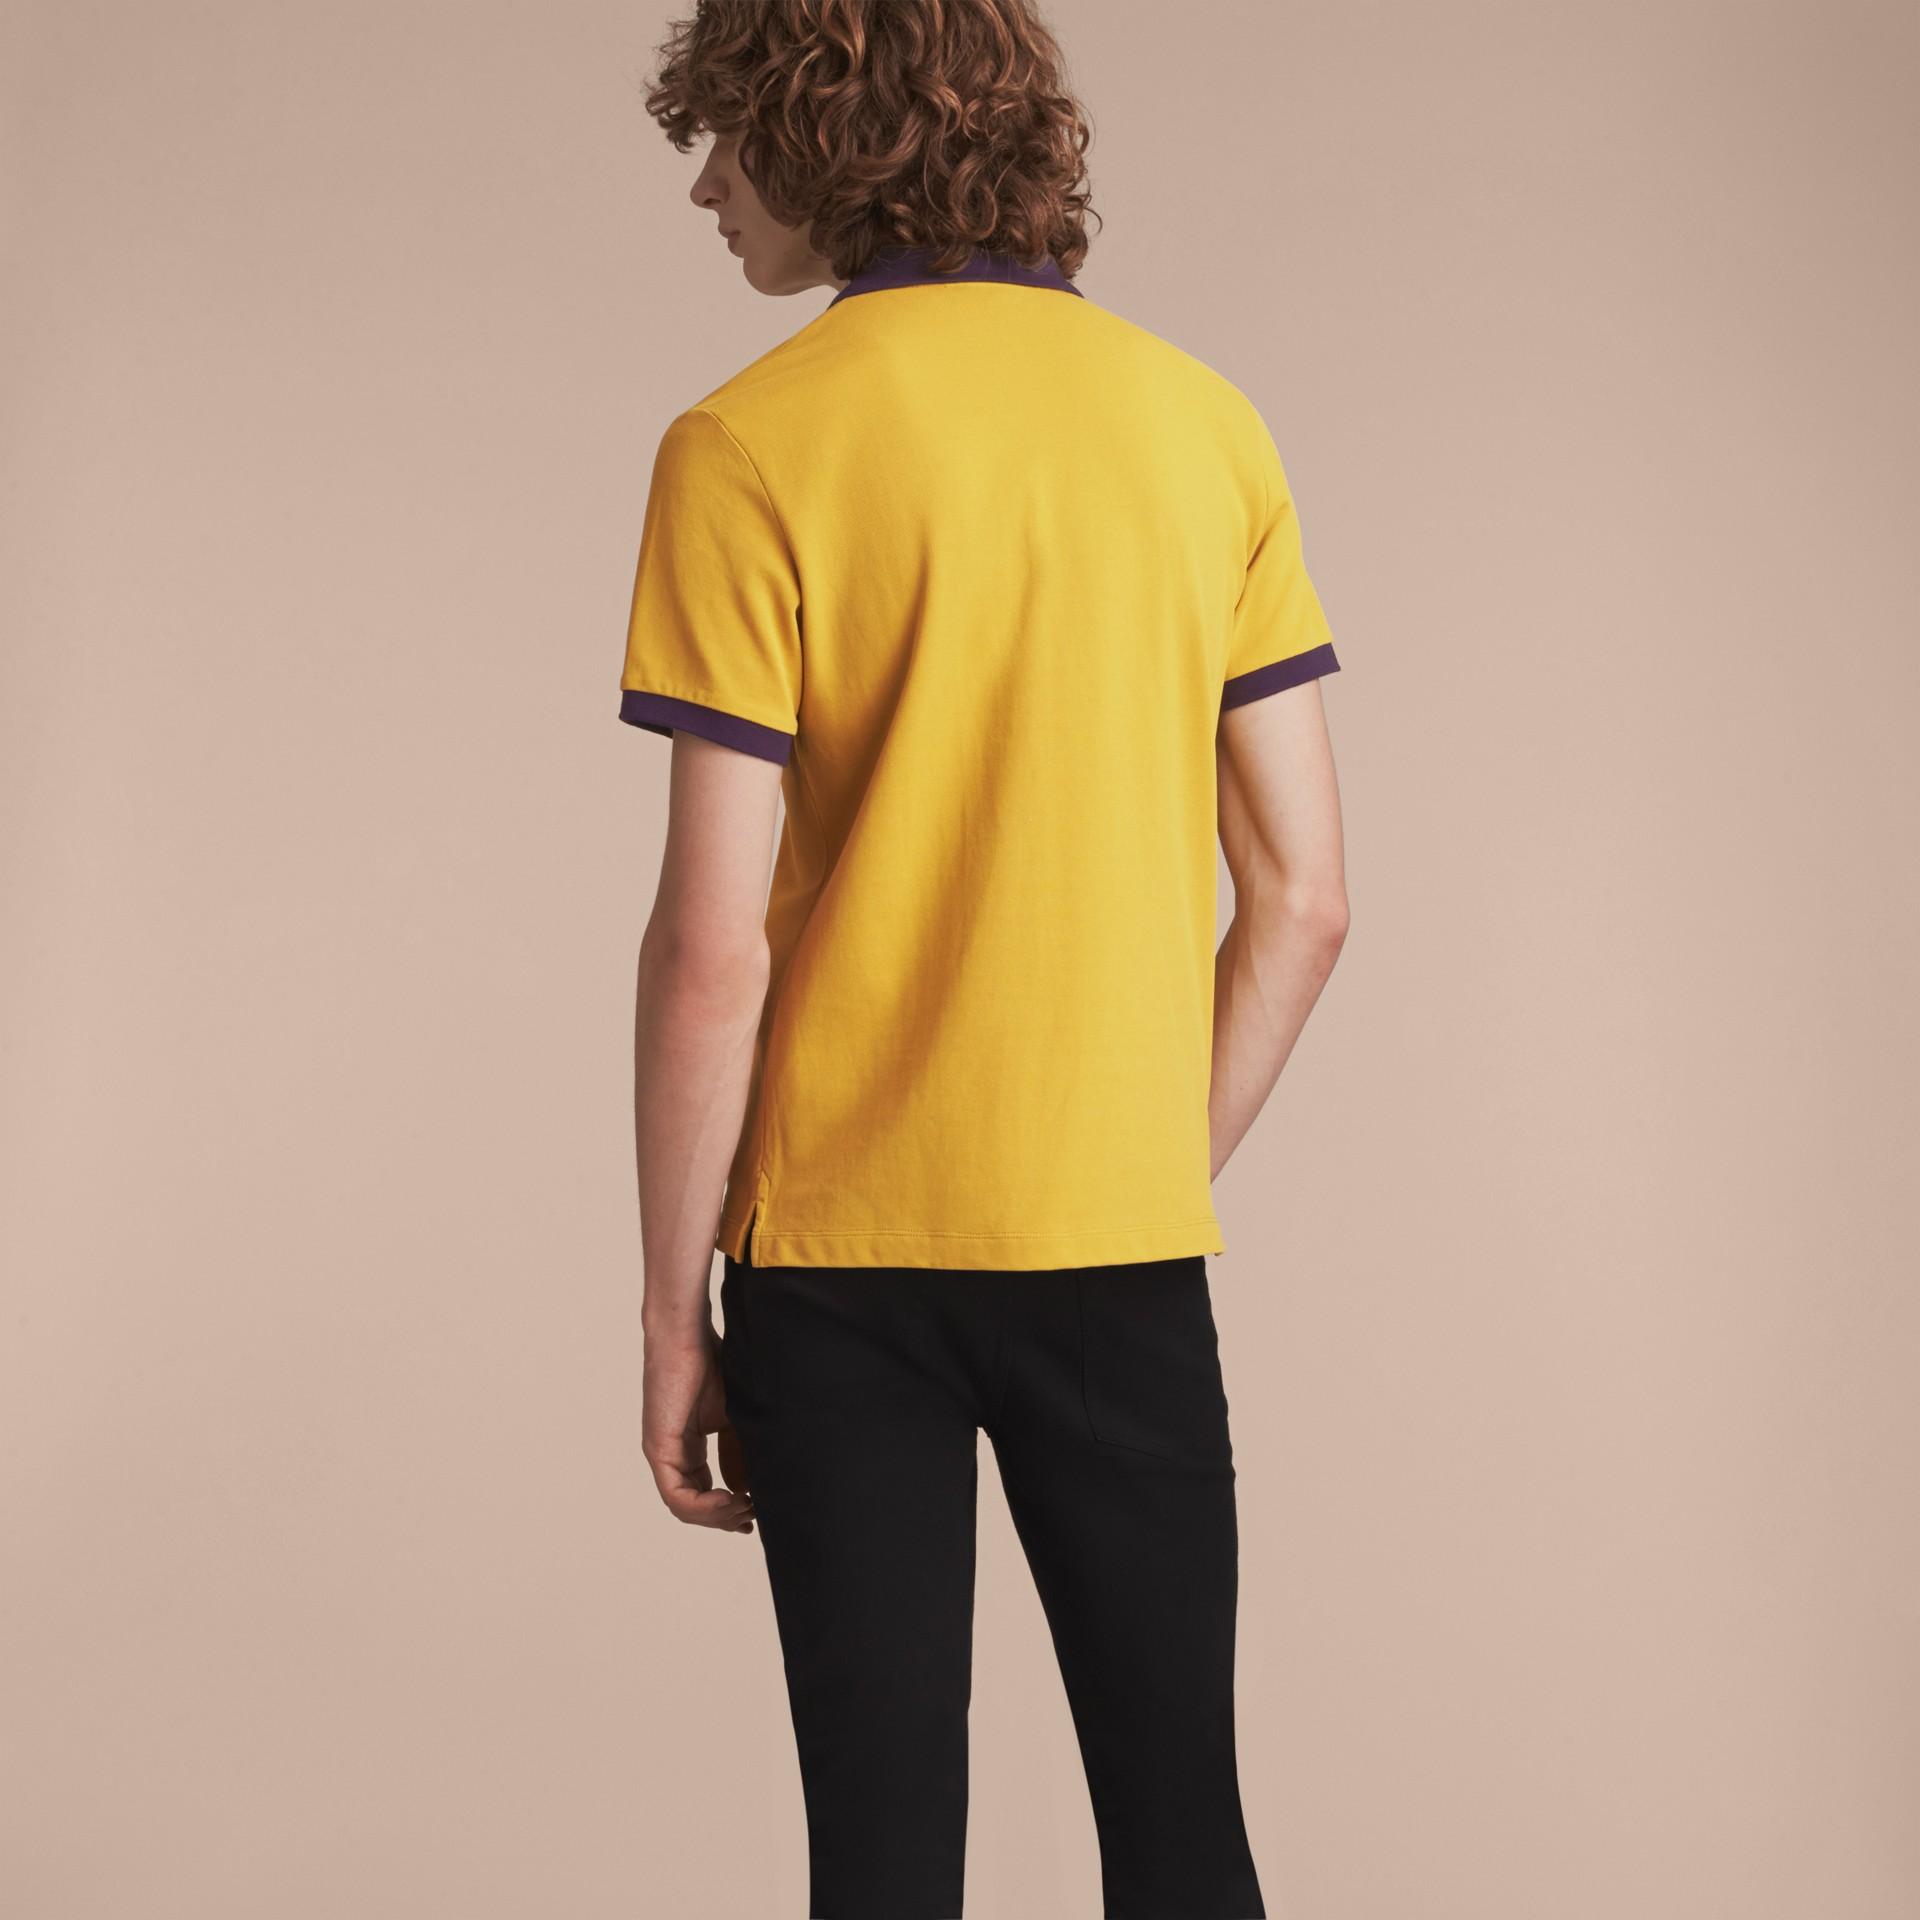 Two-tone Check Placket Cotton Piqué Polo Shirt Gorse Yellow - gallery image 3